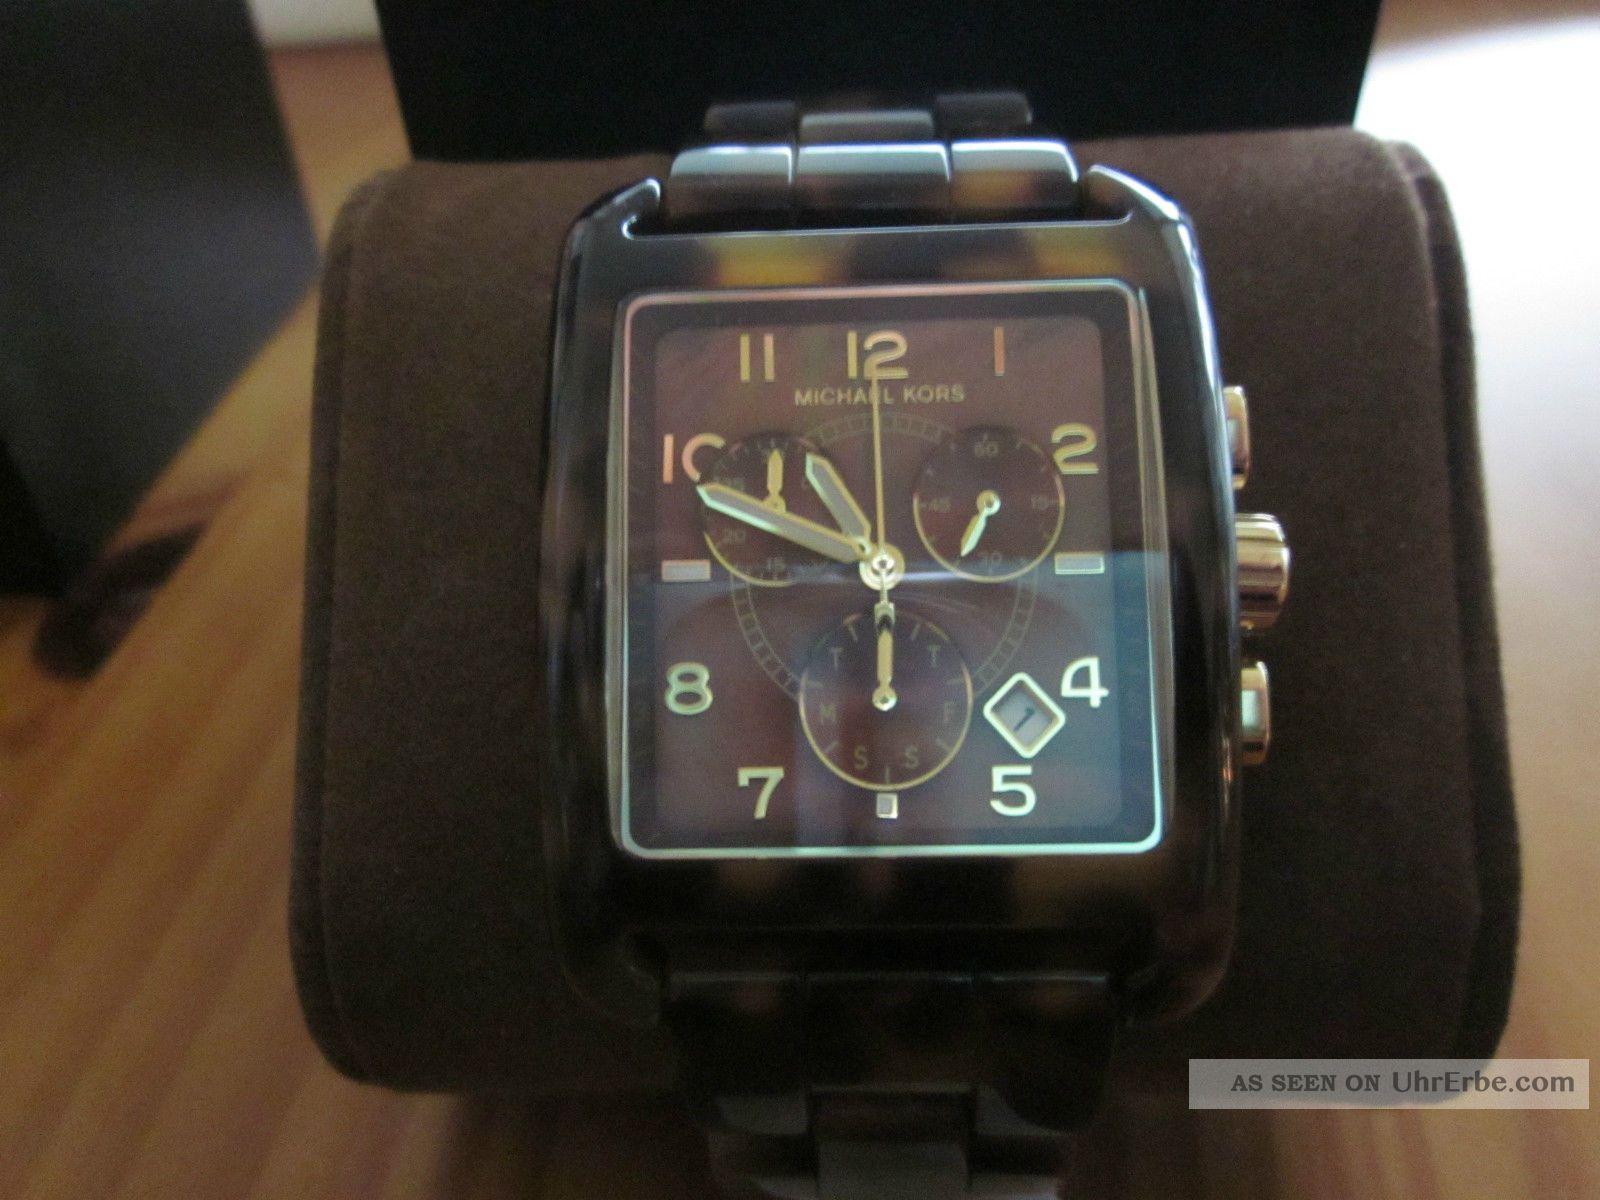 Michael Kors Armbanduhr Für Damen Armbanduhren Bild